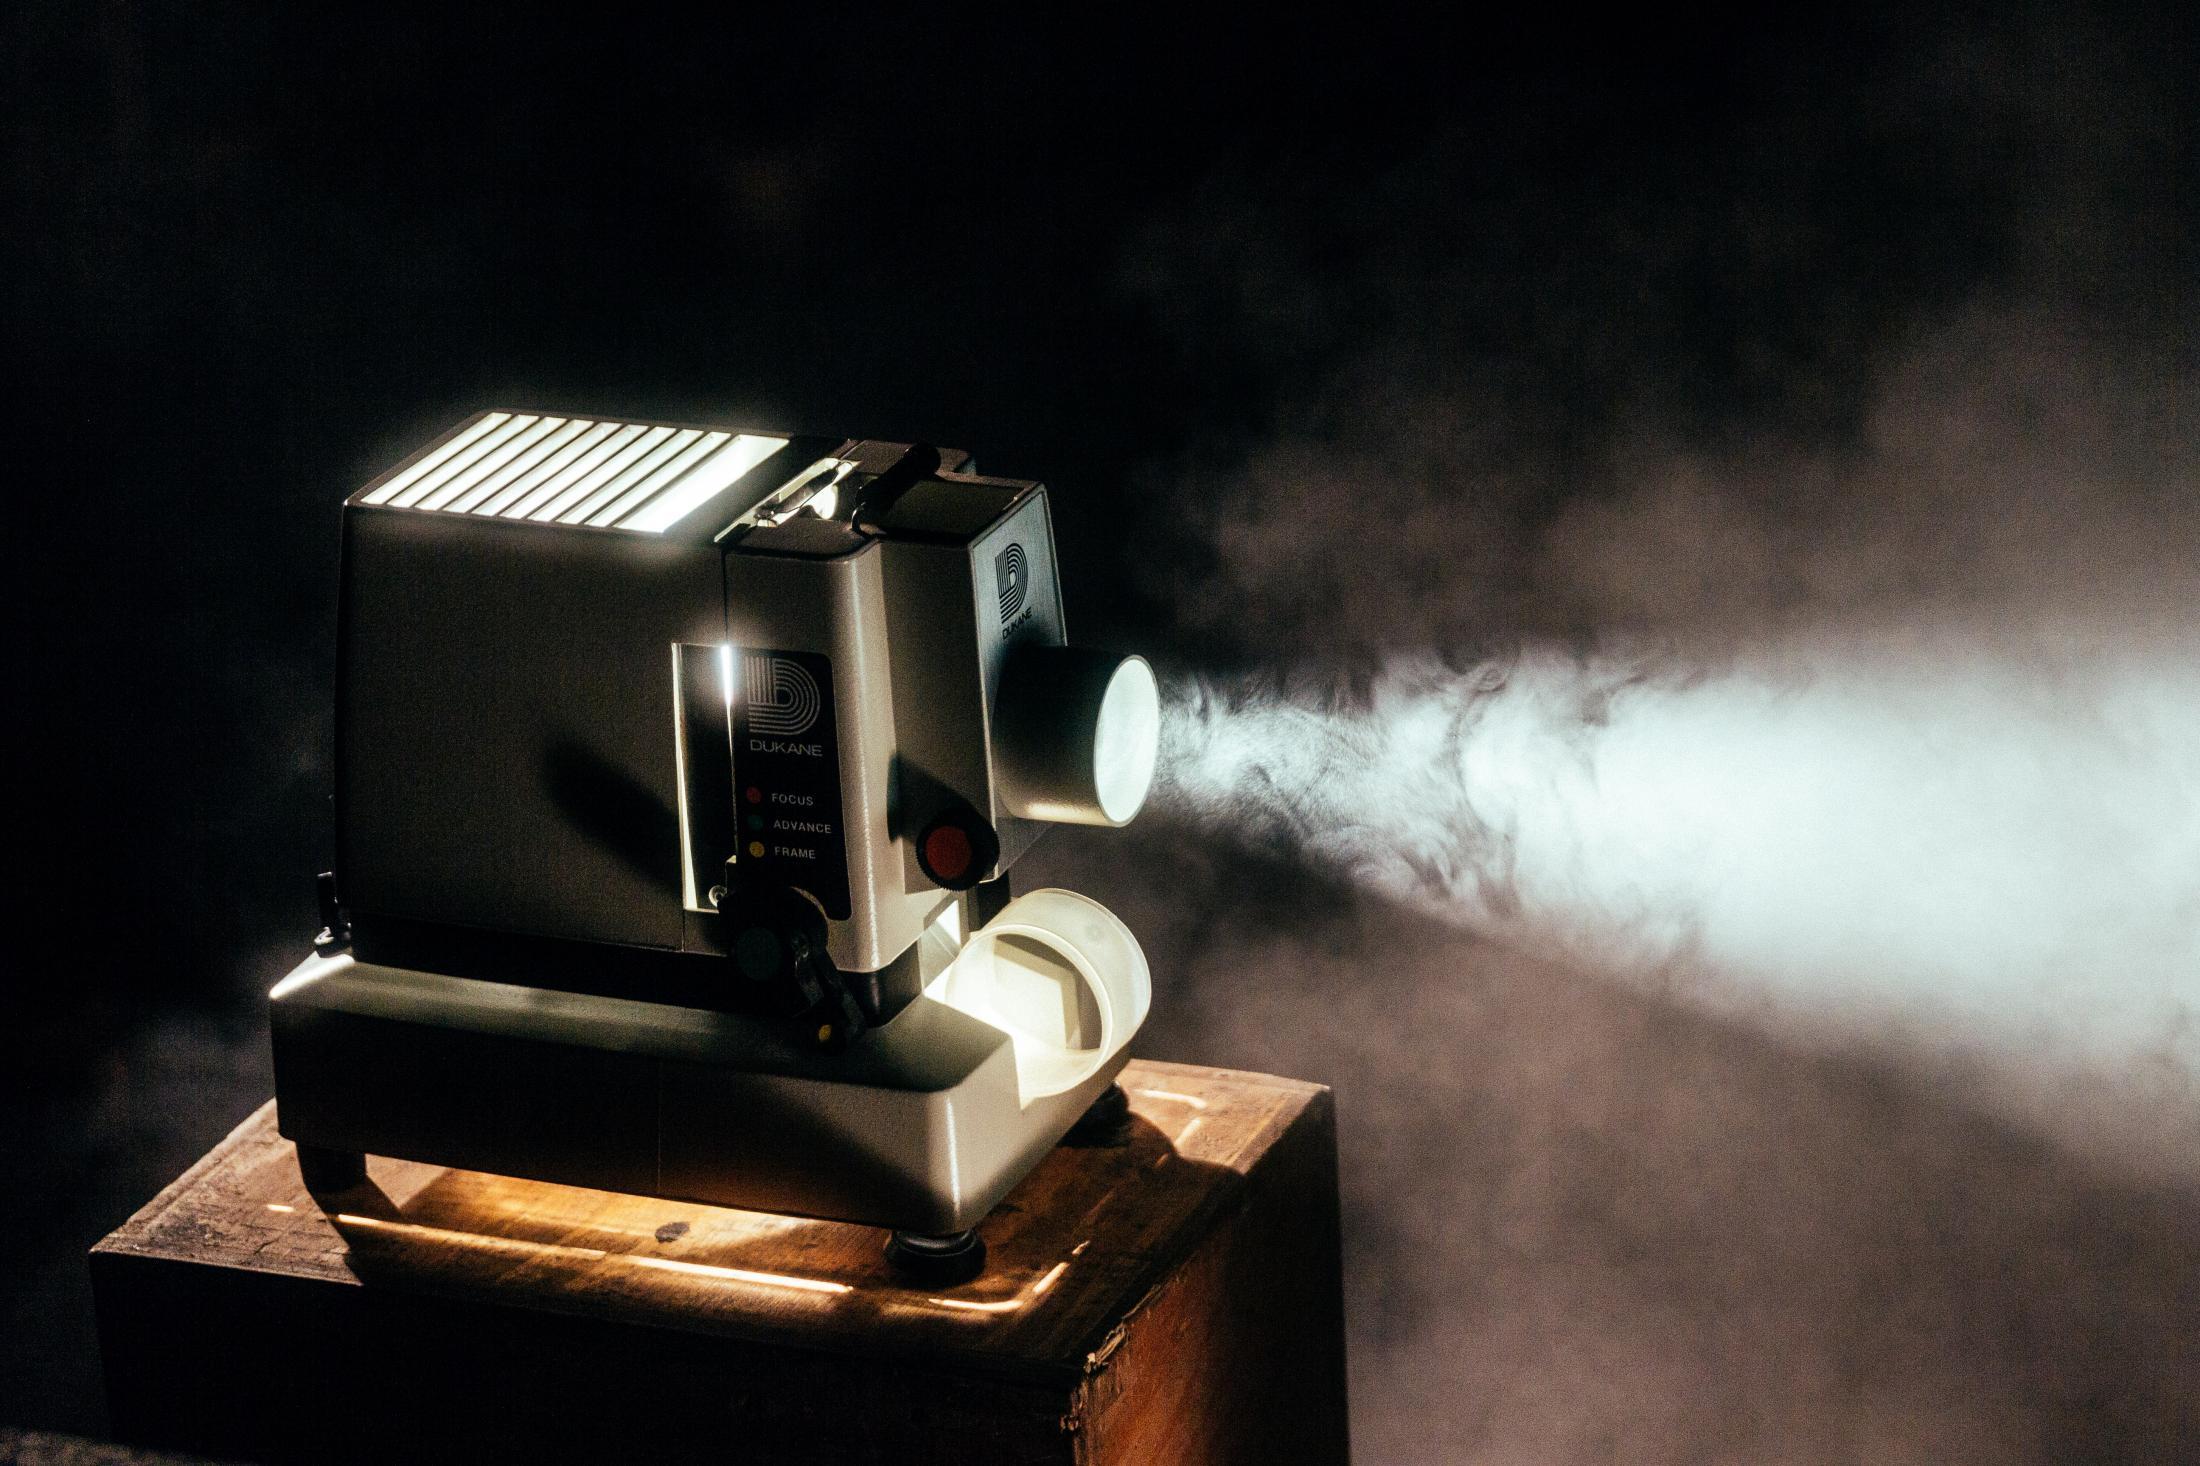 Art and Documentary Photography - Loading jeremy-yap-J39X2xX_8CQ-unsplash_film_projector.jpg